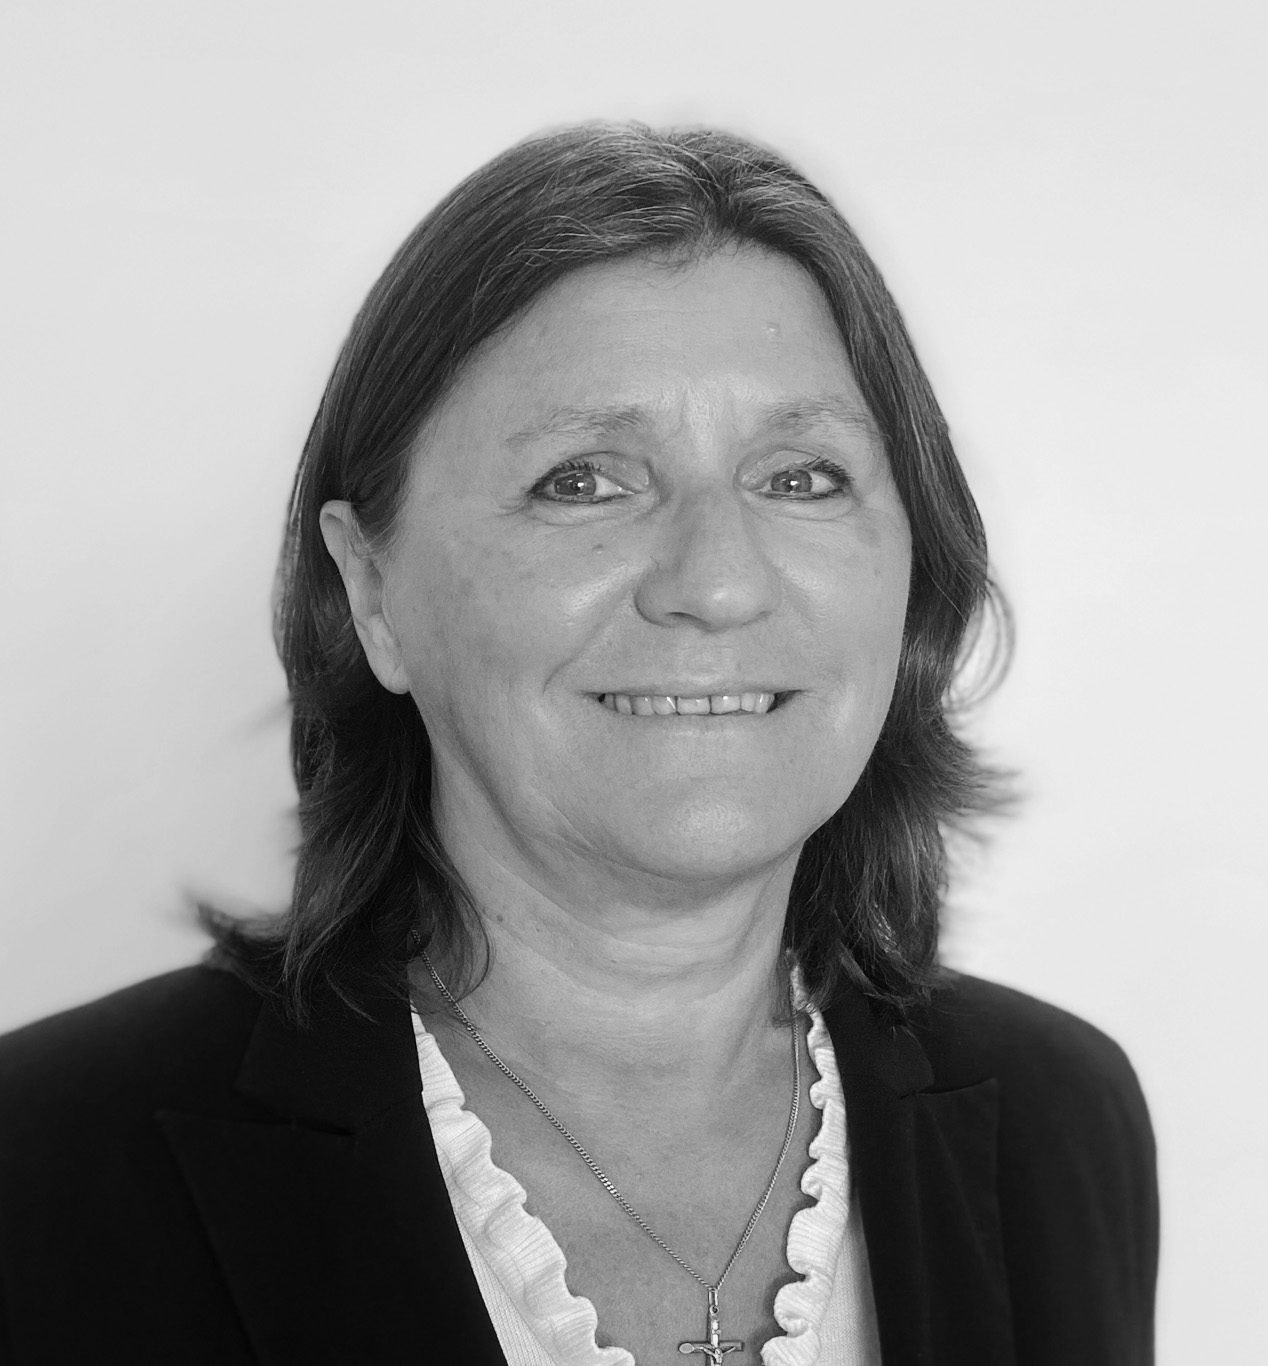 Zdenka Breznik